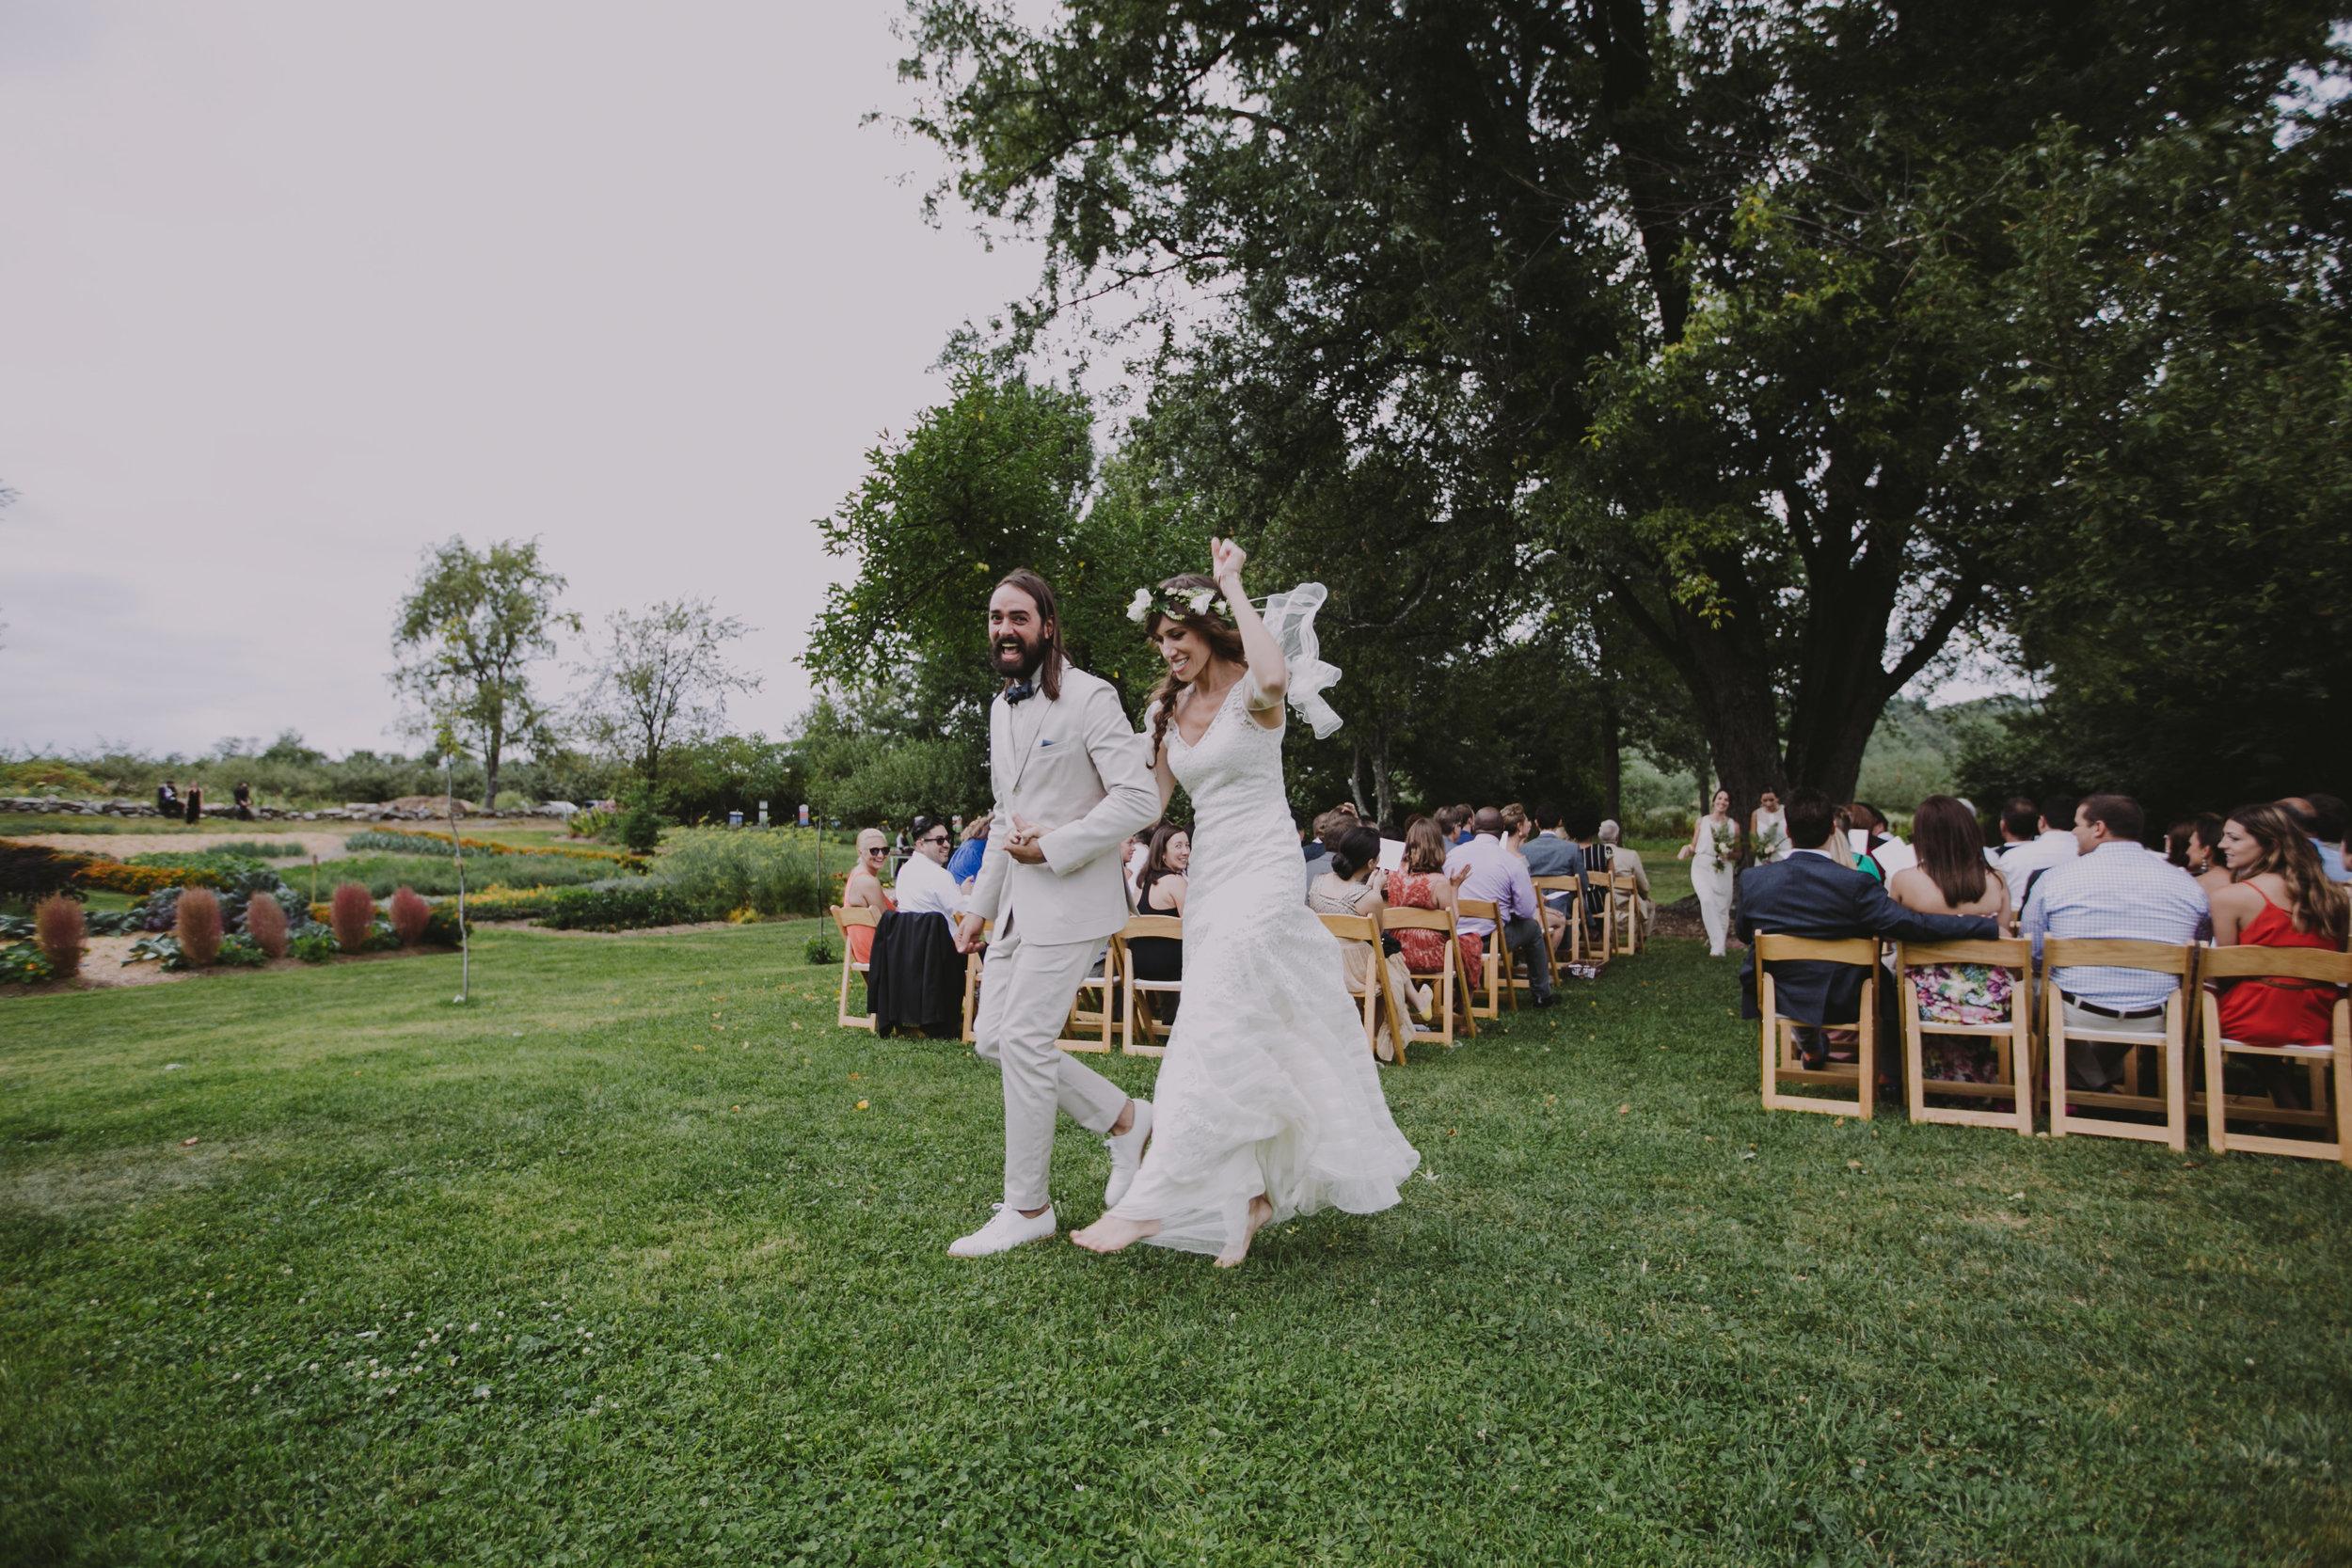 LIBERTY_VIEW_FARM_HIGHLAND_NY_WEDDING_CHELLISE_MICHAEL_PHOTOGRAPHY842.JPG